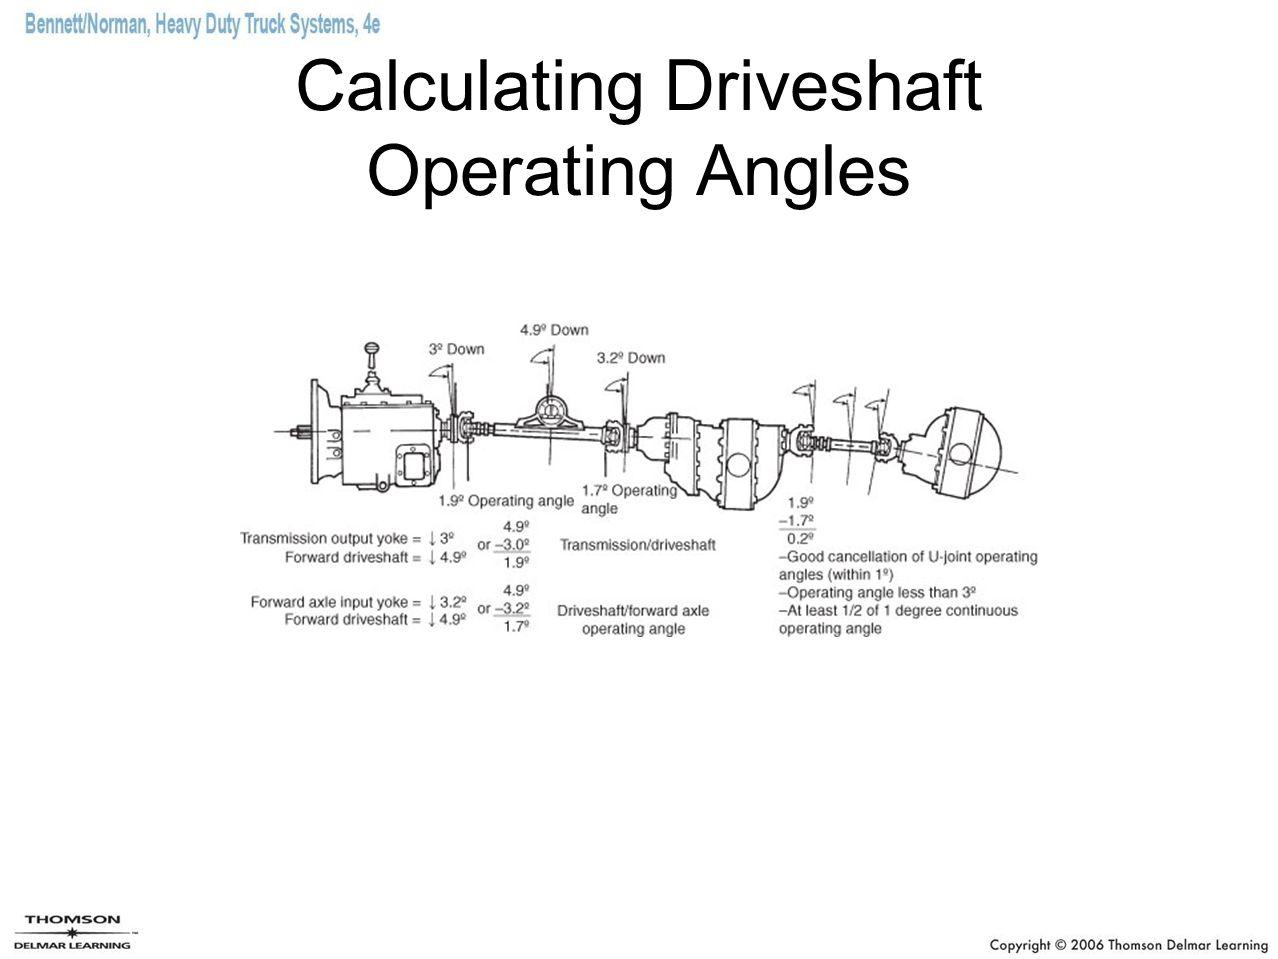 Calculating Driveshaft Operating Angles